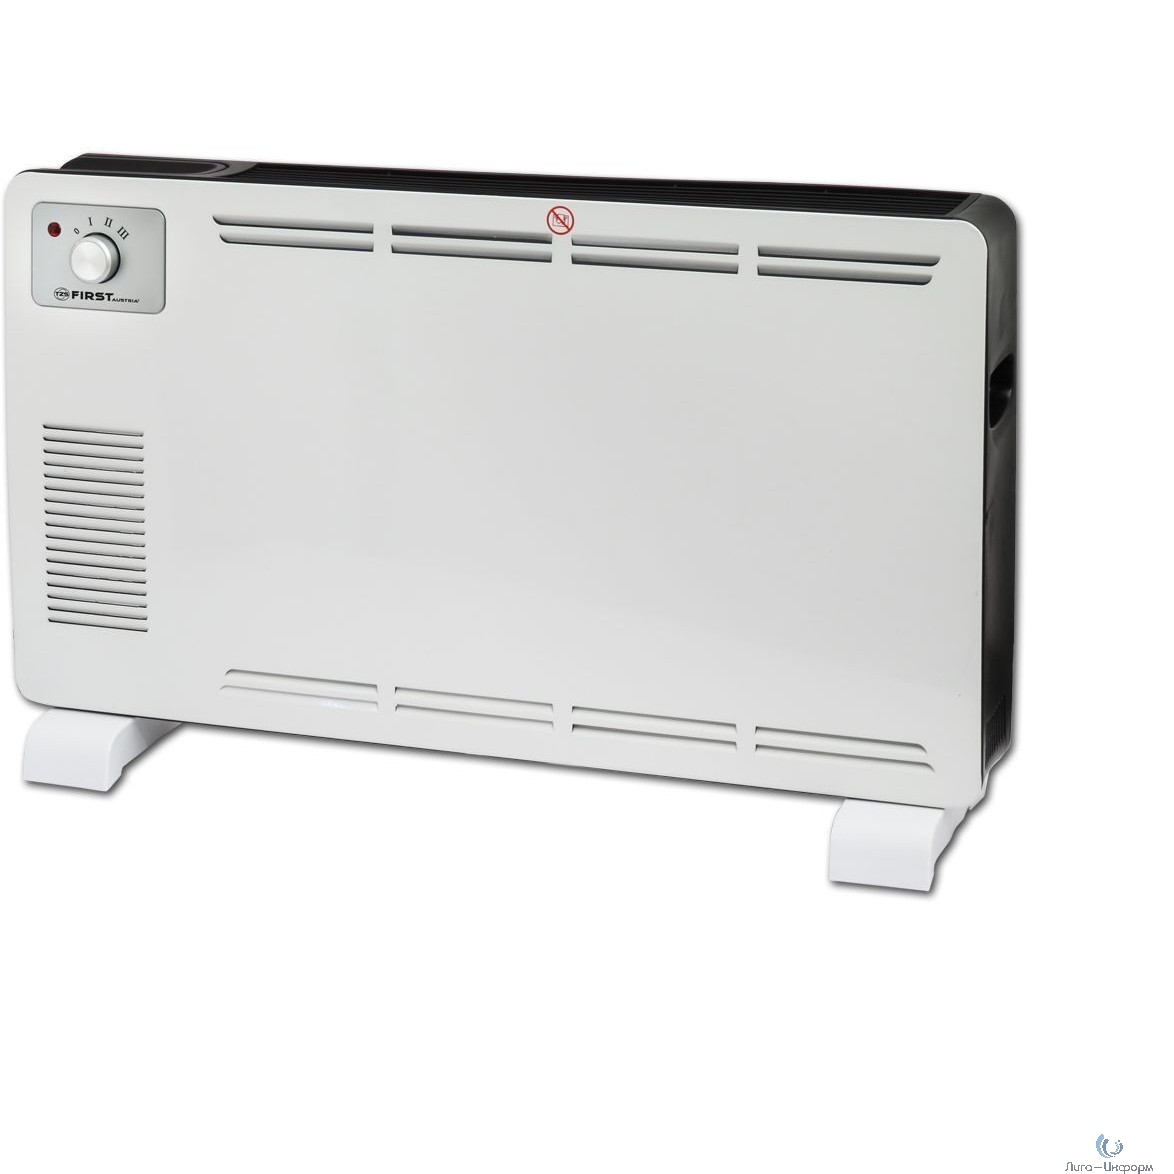 FIRST (FA-5570-2 White) Тепловентилятор конвекторный, 750 Вт/1250 Вт/2000 Вт, 25 м?, термостат, белый